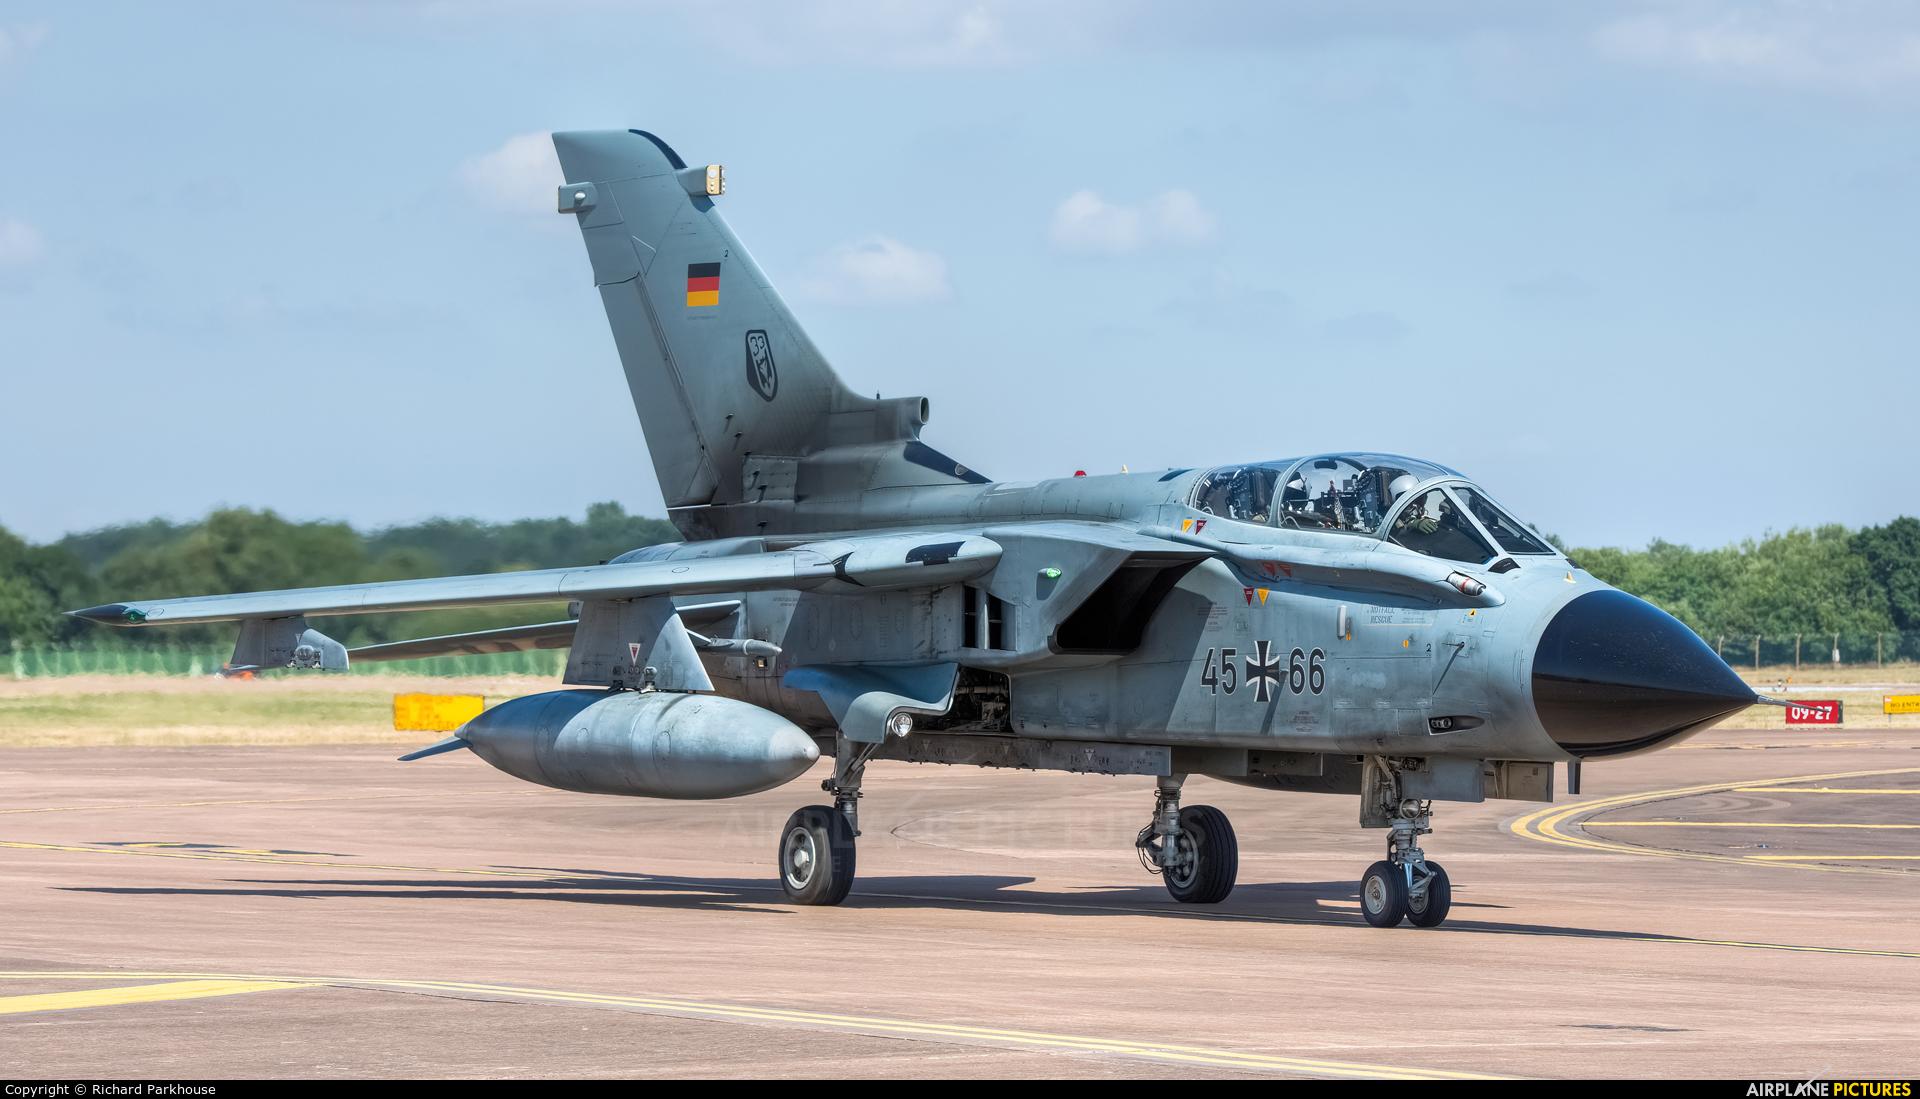 Germany - Air Force 45+66 aircraft at Fairford